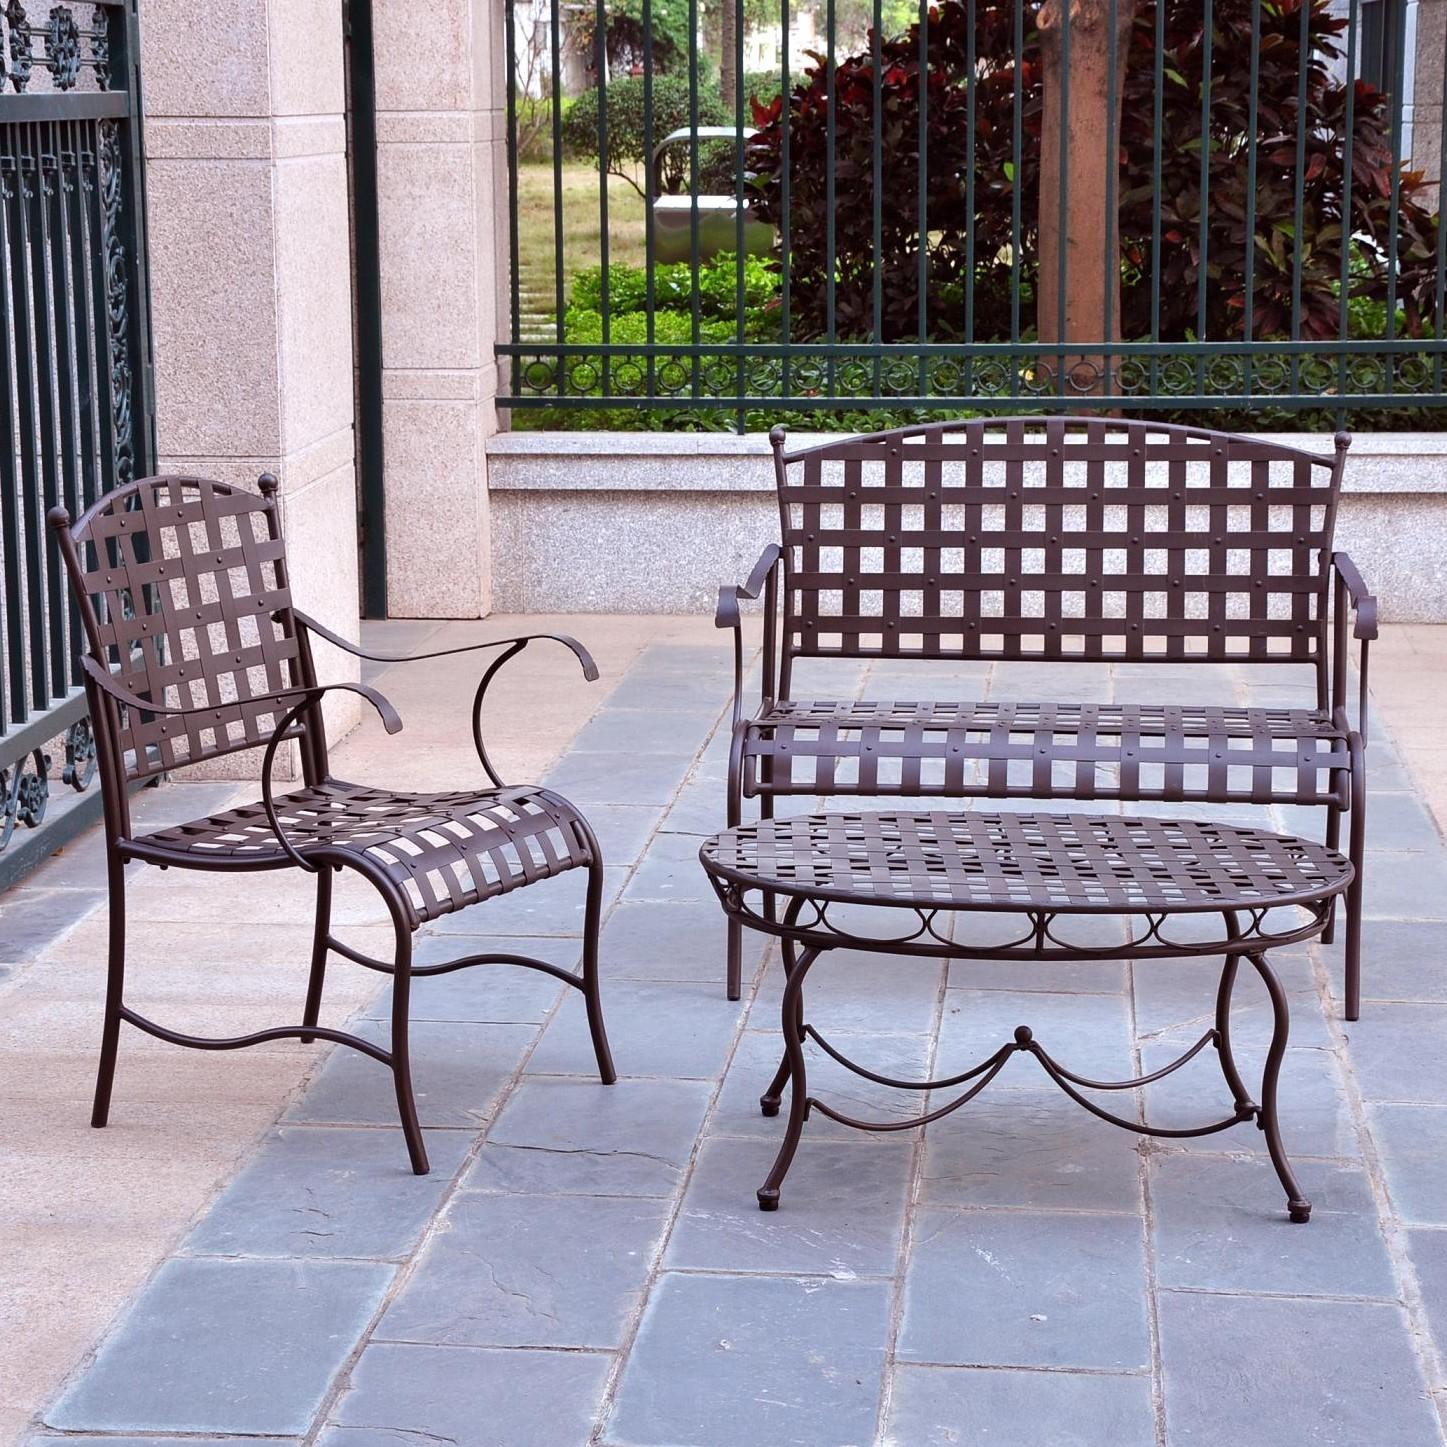 3 piece wrought iron patio furniture lounge seating group set